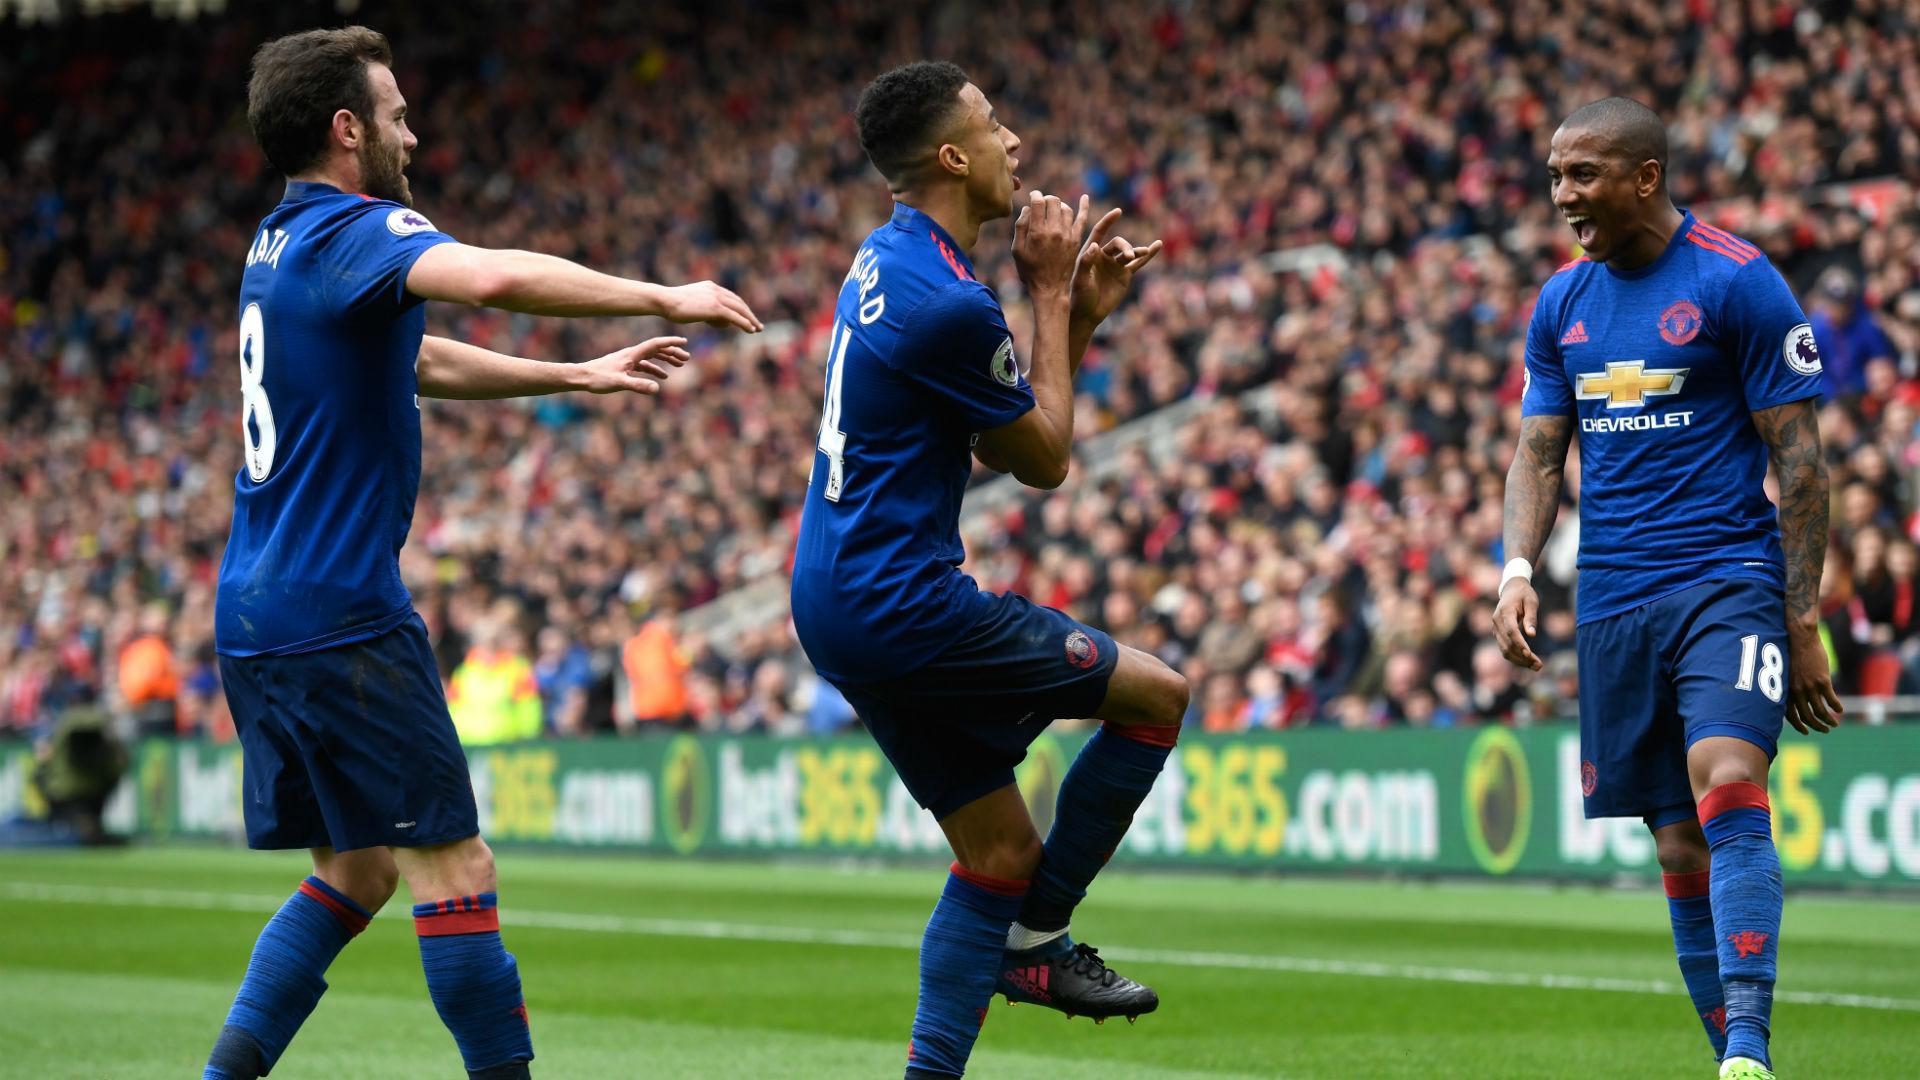 Jesse Lingard Renueva Con El Manchester United Hasta 2021